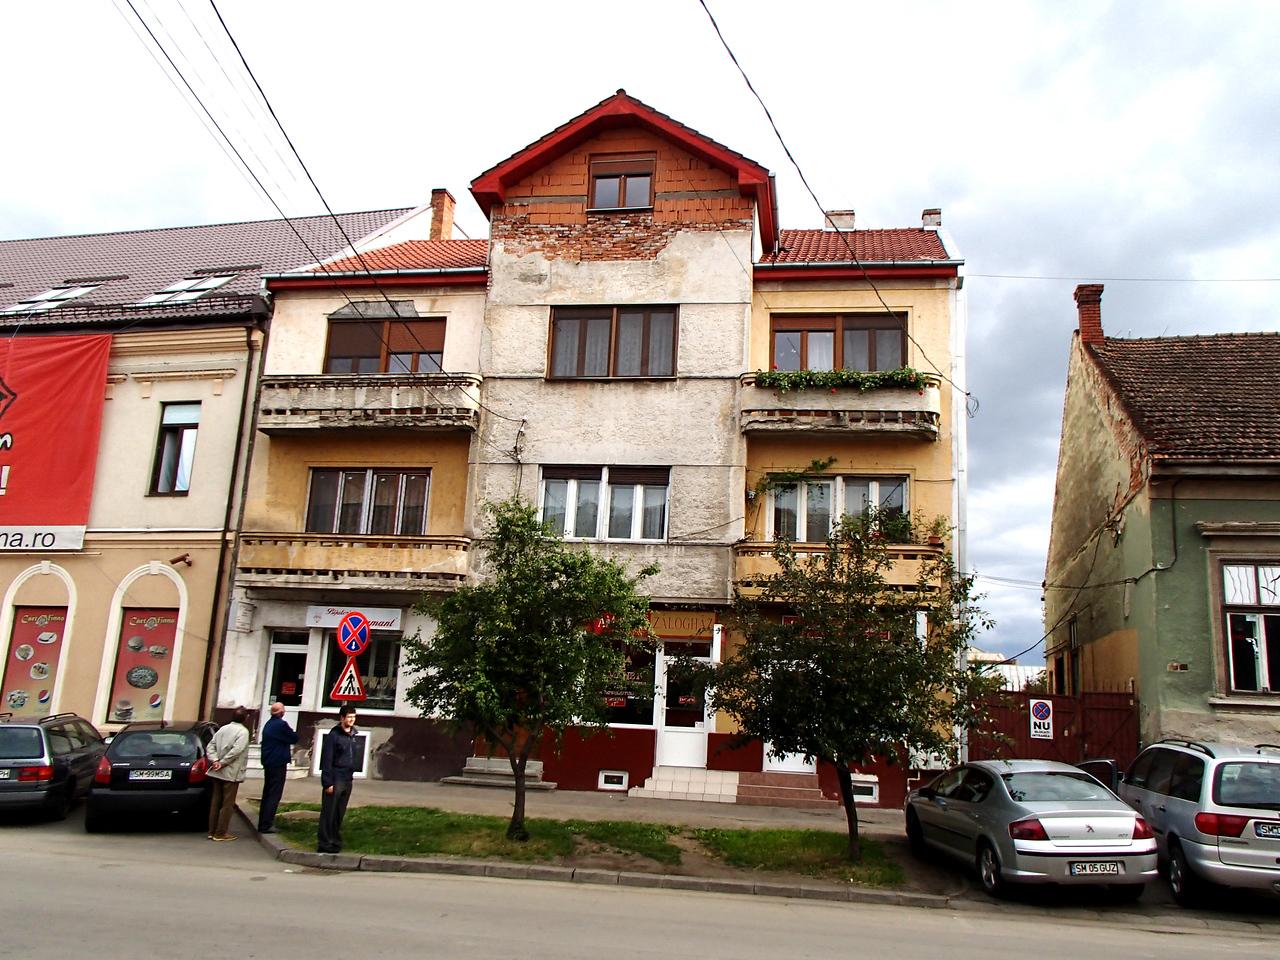 0098 Szatmar Kolcsei utca 4, house of Ibi neni and Dezso bacsi